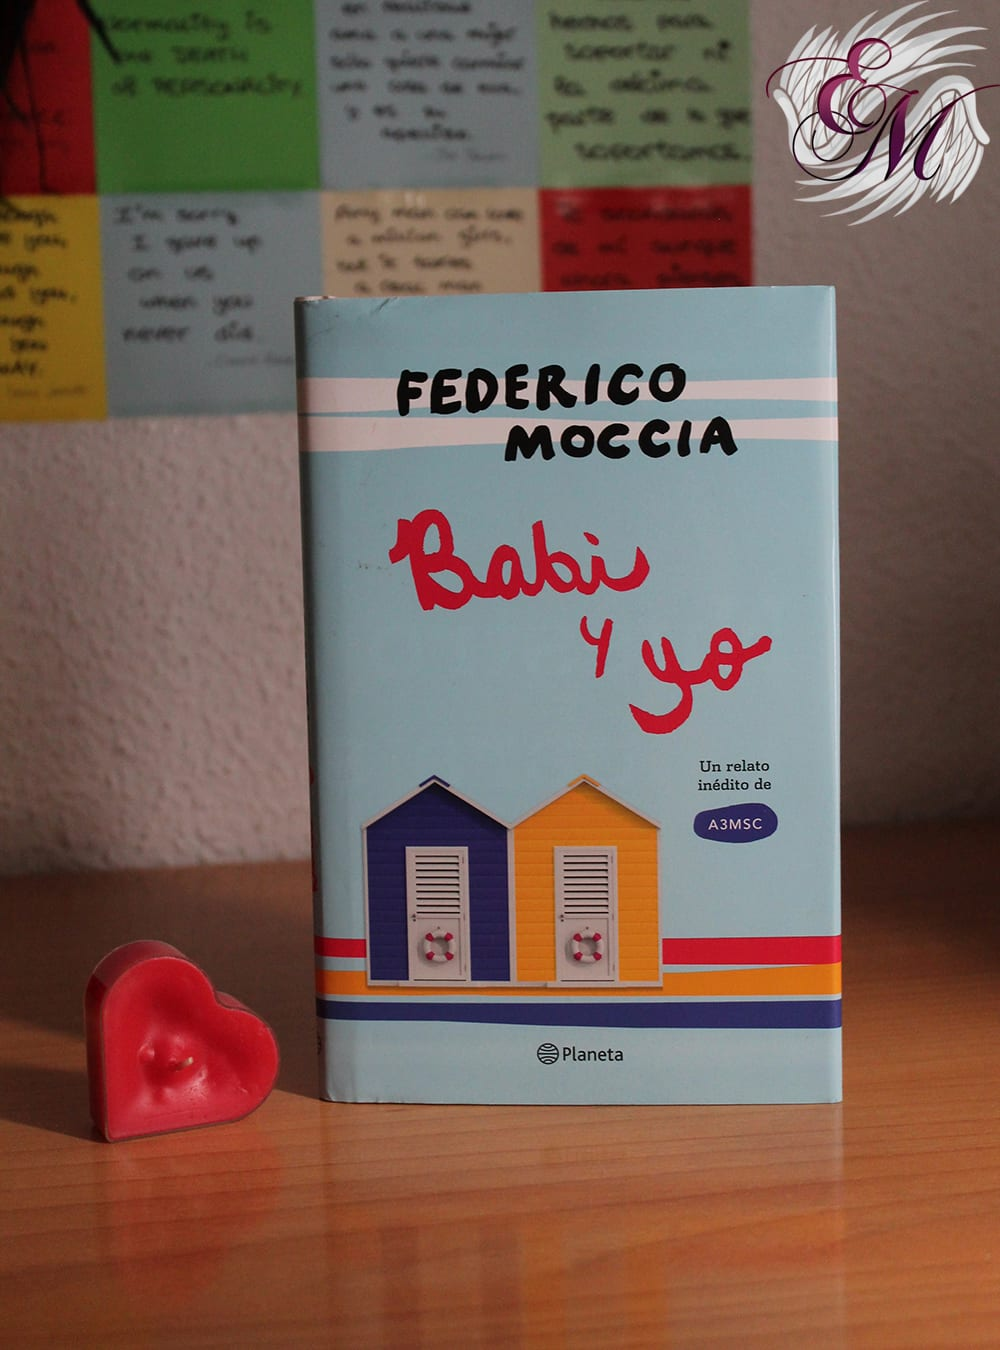 Babi y yo, de Federico Moccia - Reseña